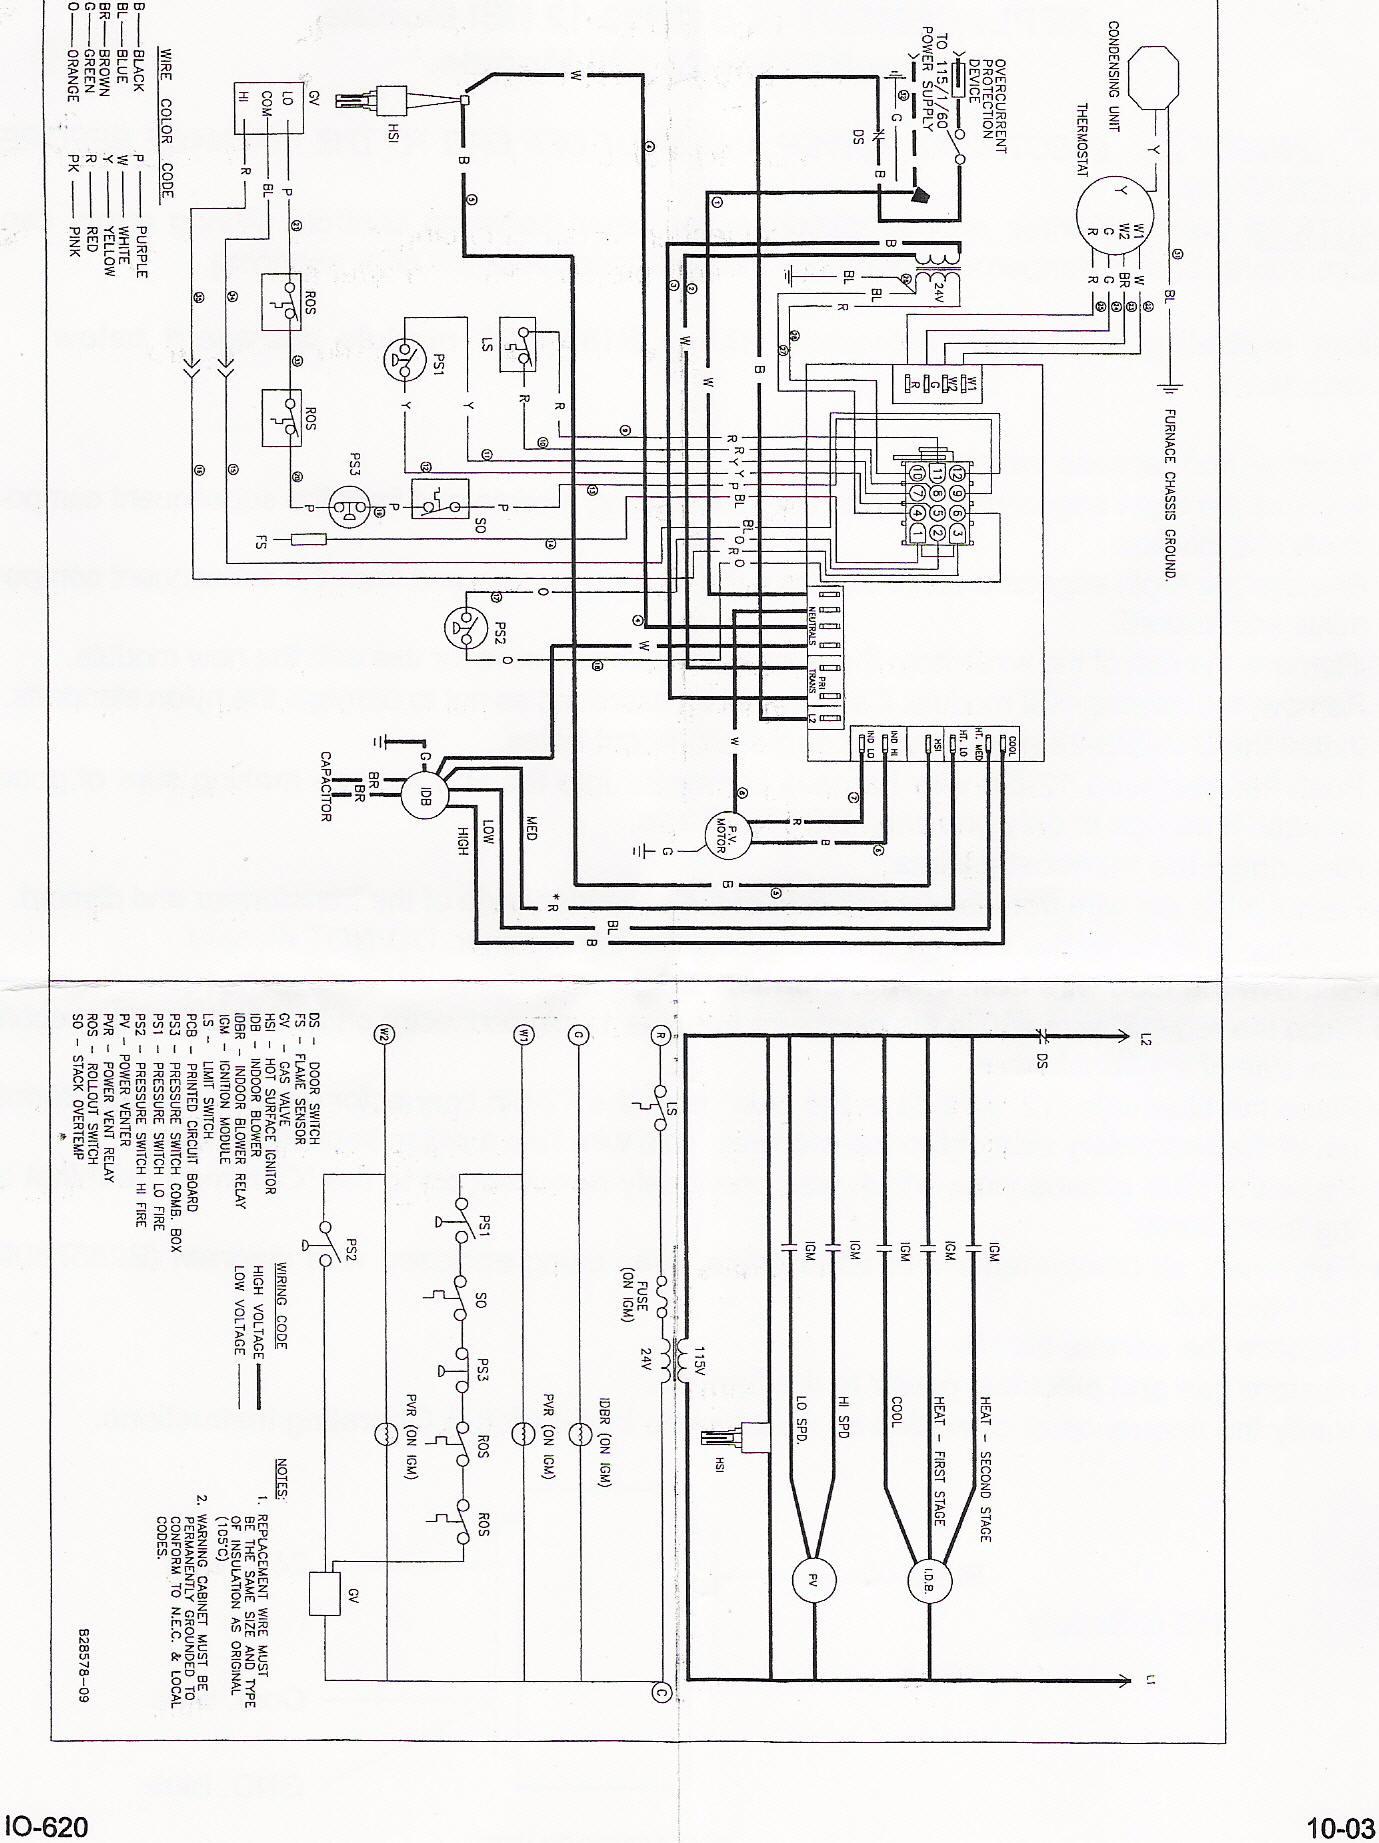 Pleasing Goodman Control Board Wiring Diagram Diagram Data Schema Wiring Cloud Orsalboapumohammedshrineorg